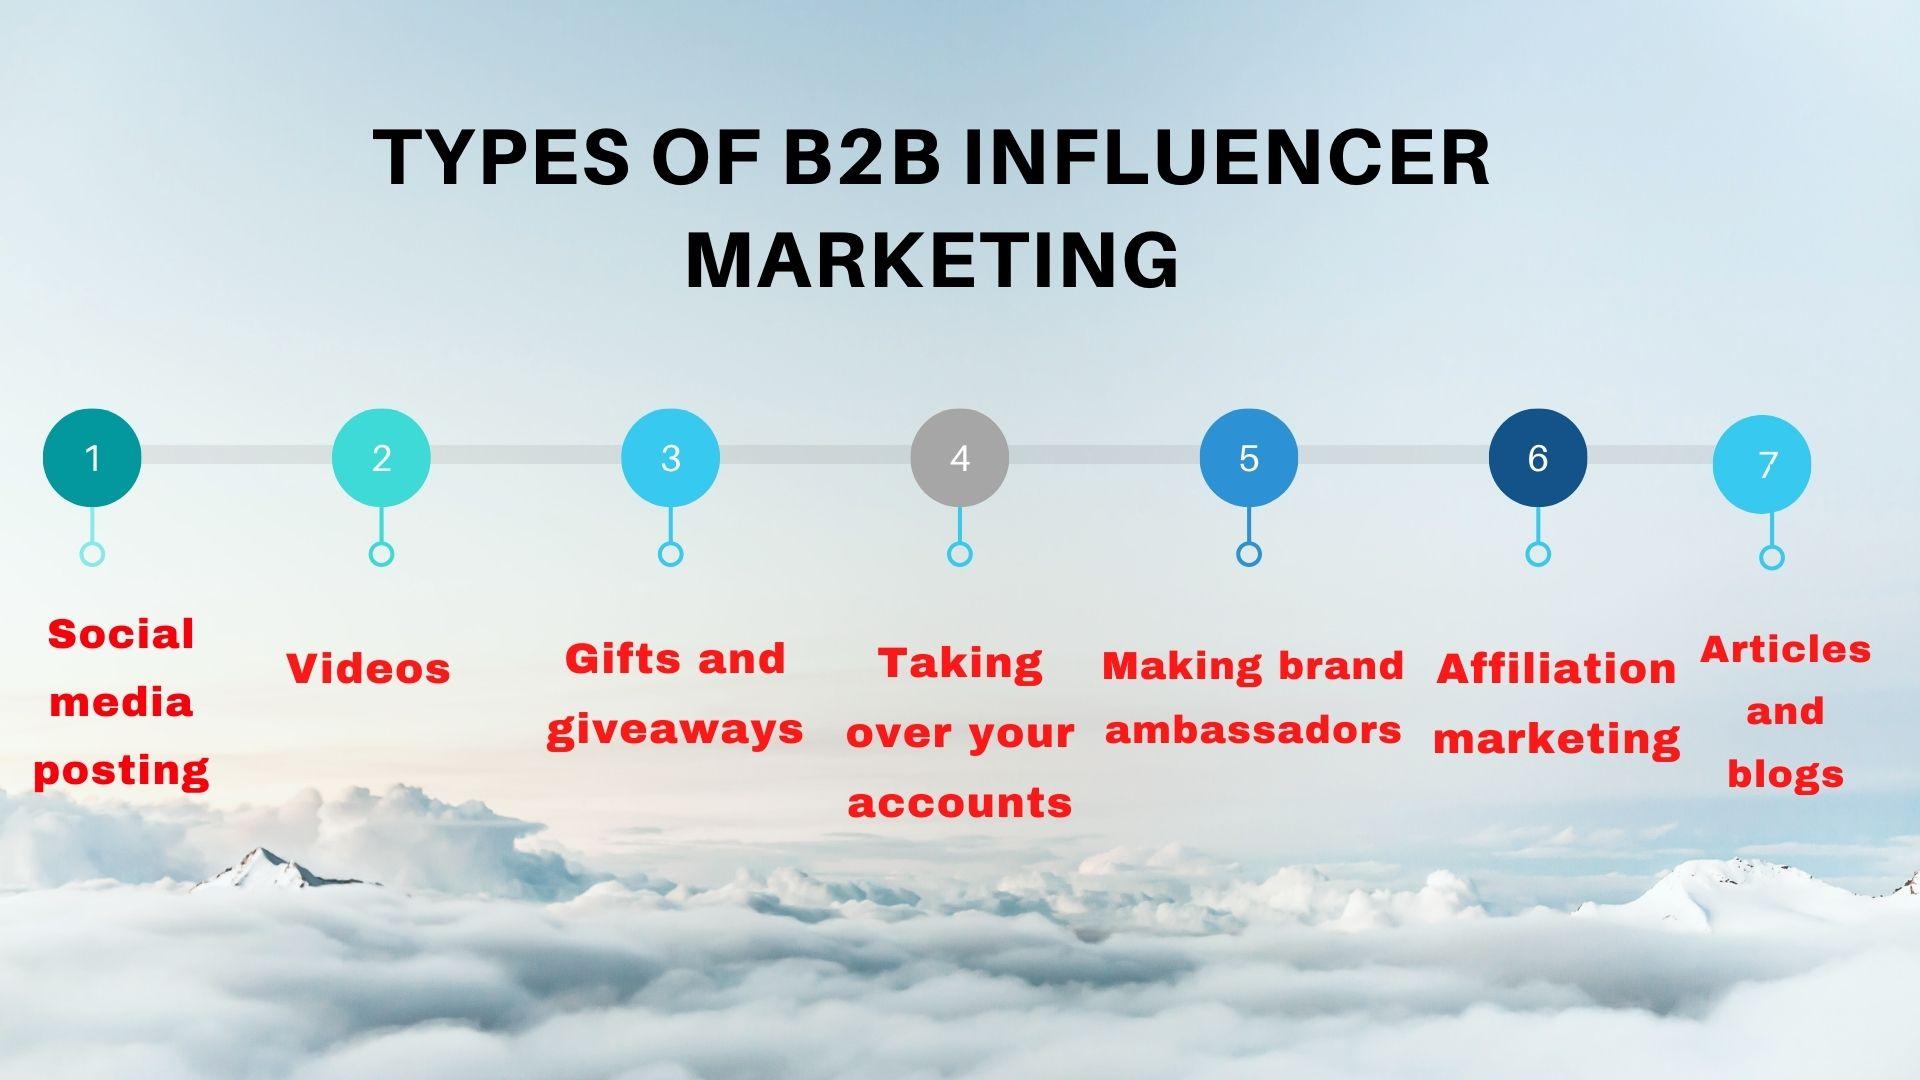 types of b2b influencer marketing